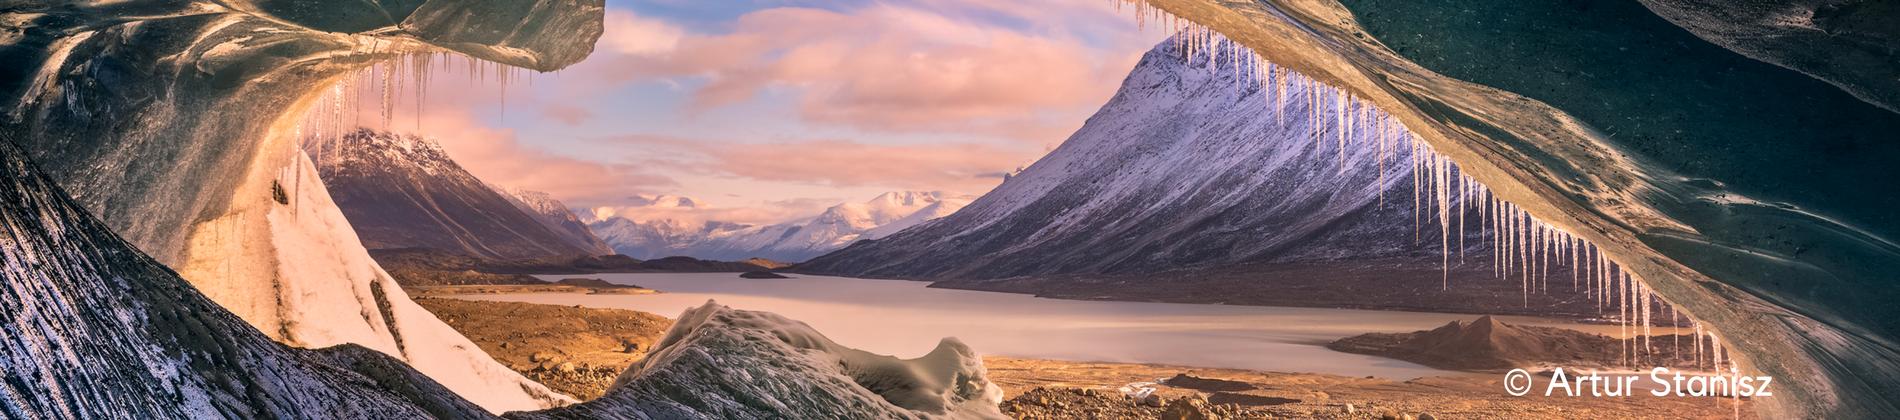 Image of Baffin Island